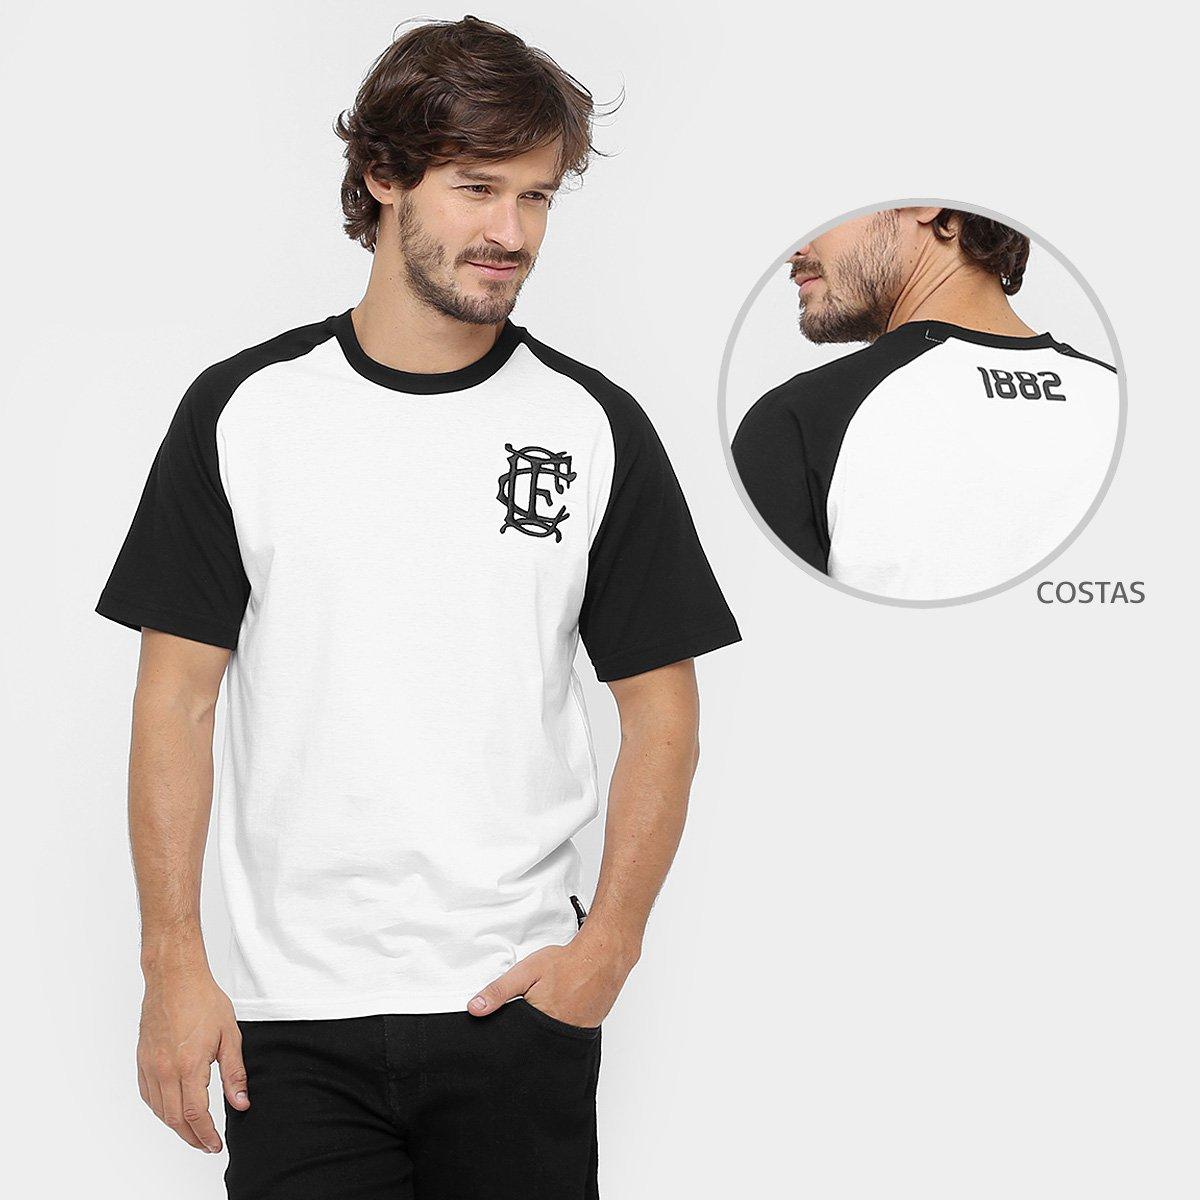 Camiseta Corinthian-Casuals Retrô 1882 Masculina 511744c8a7c9c